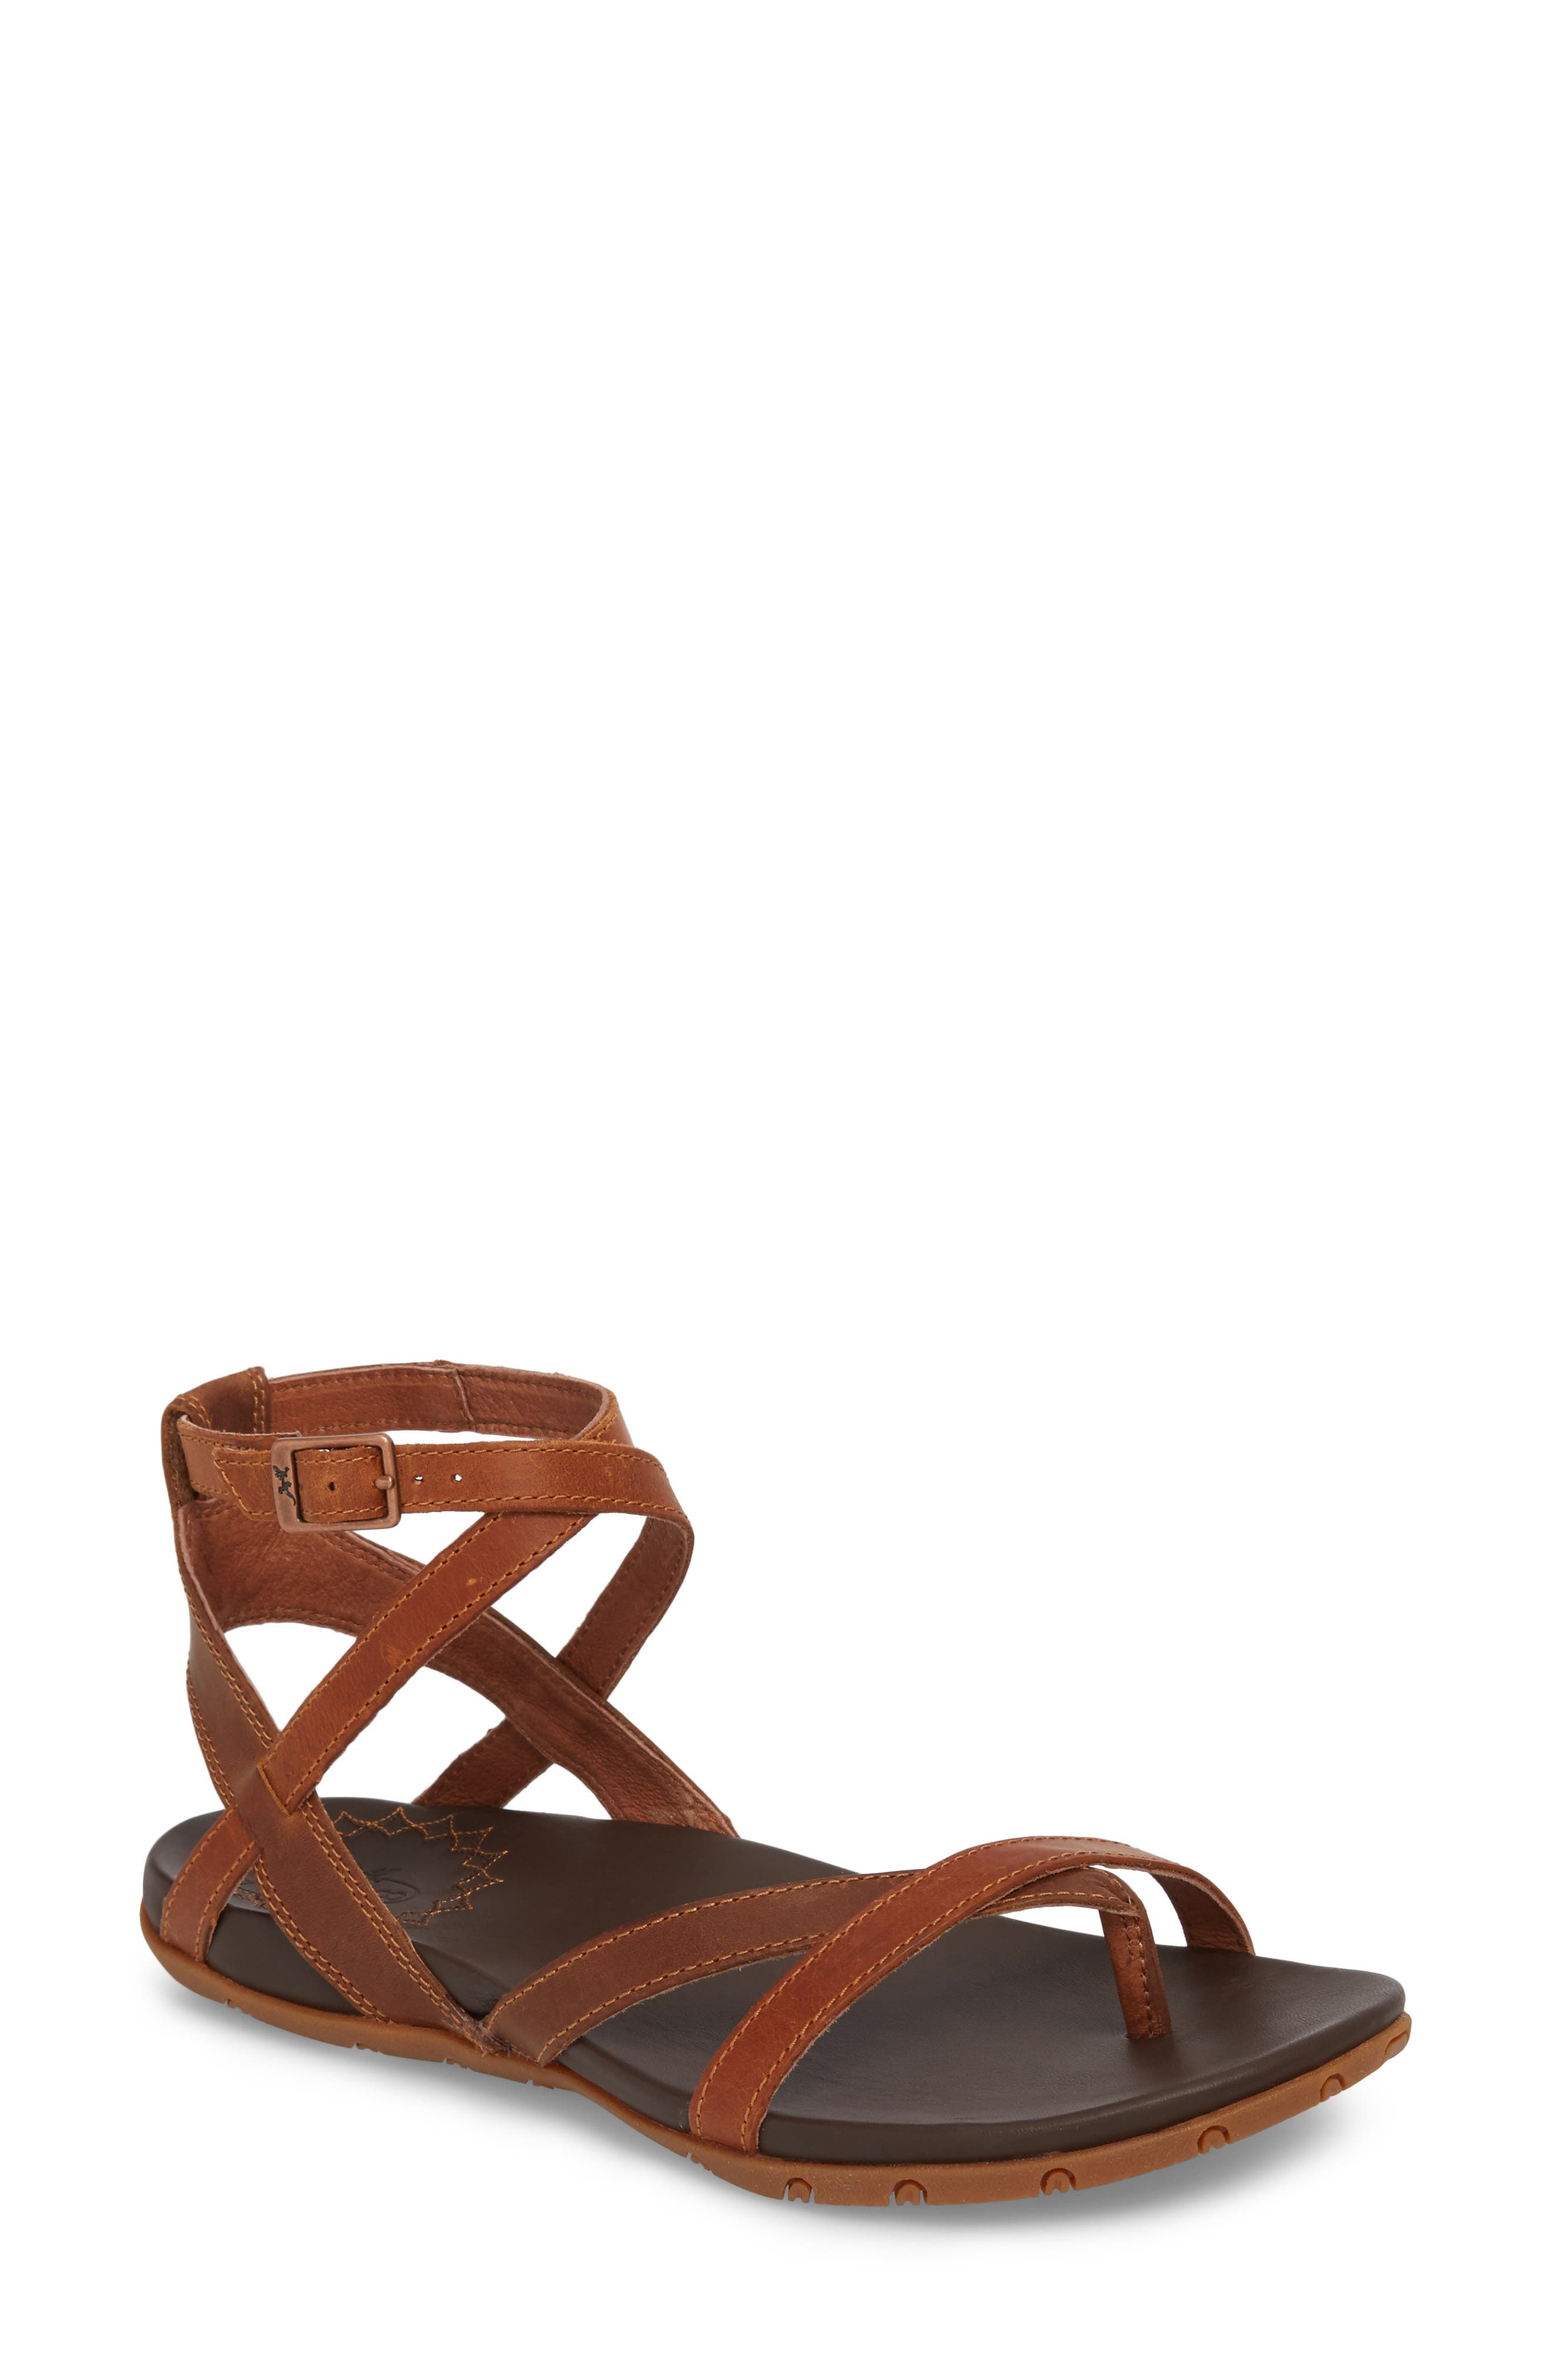 Juniper Sandal,                             Main thumbnail 1, color,                             Rust Leather